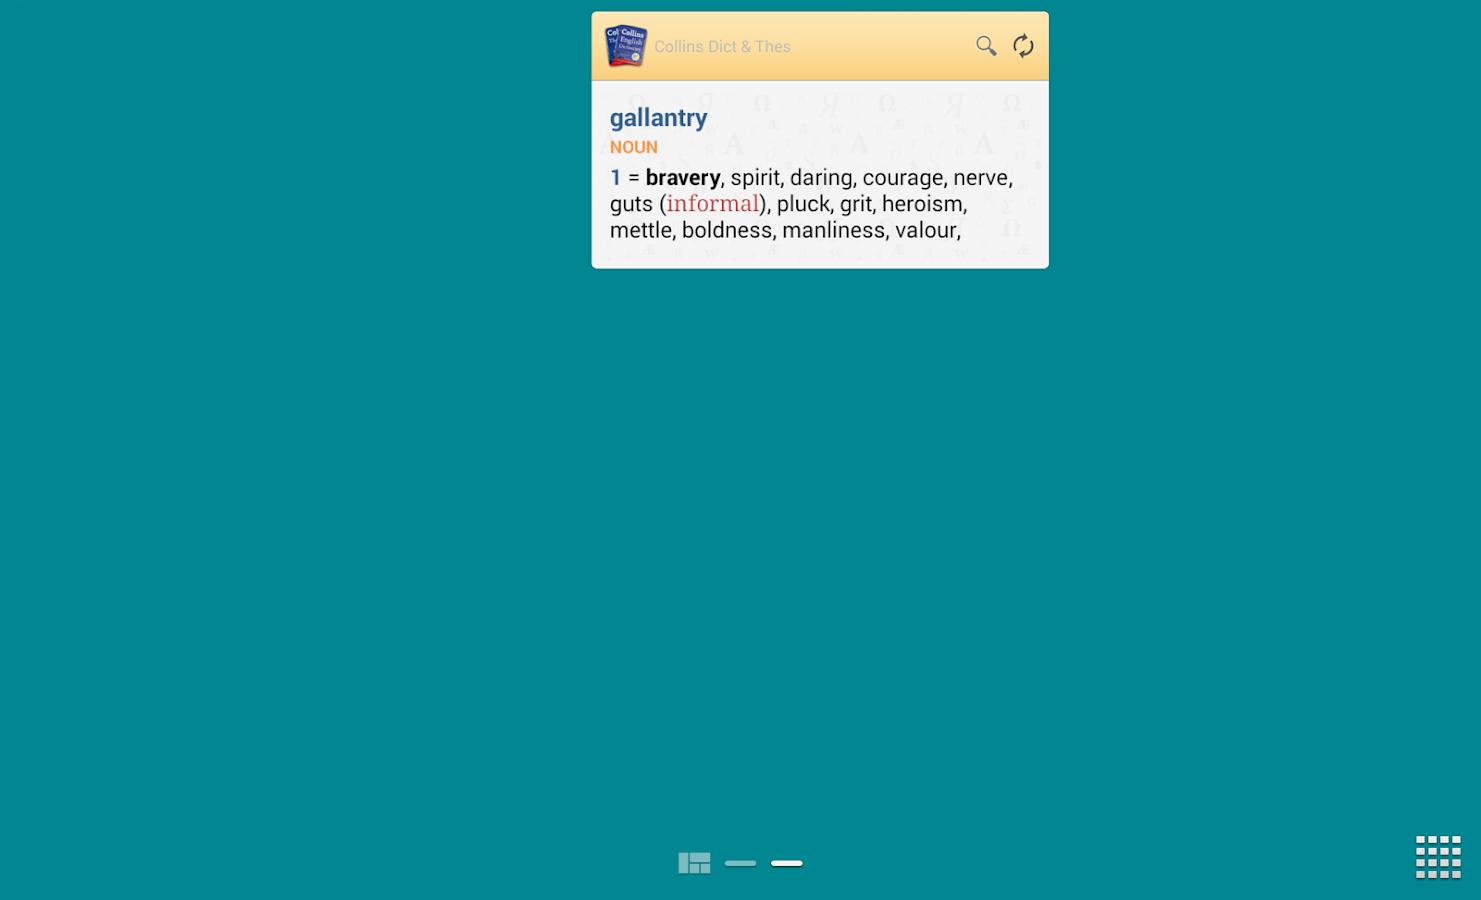 Collins English and Thesaurus - screenshot